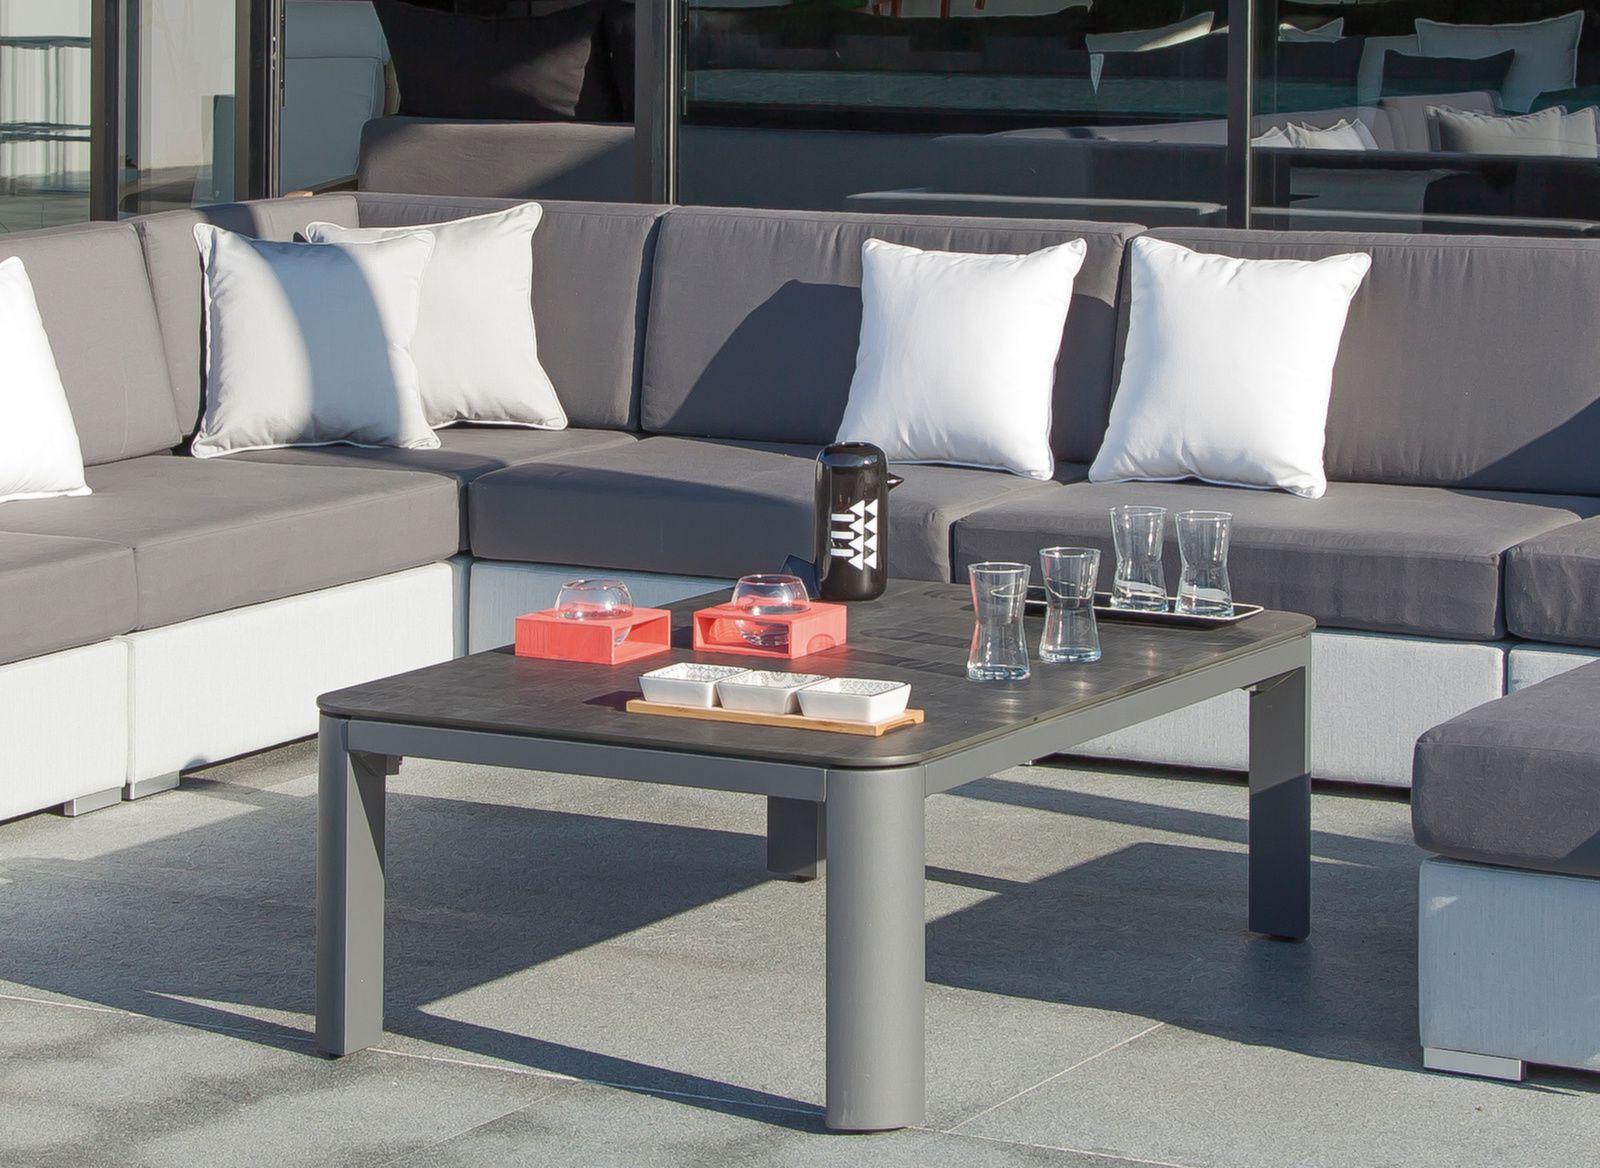 Table basse Eole 120 x 80 cm, plateau Trespa®